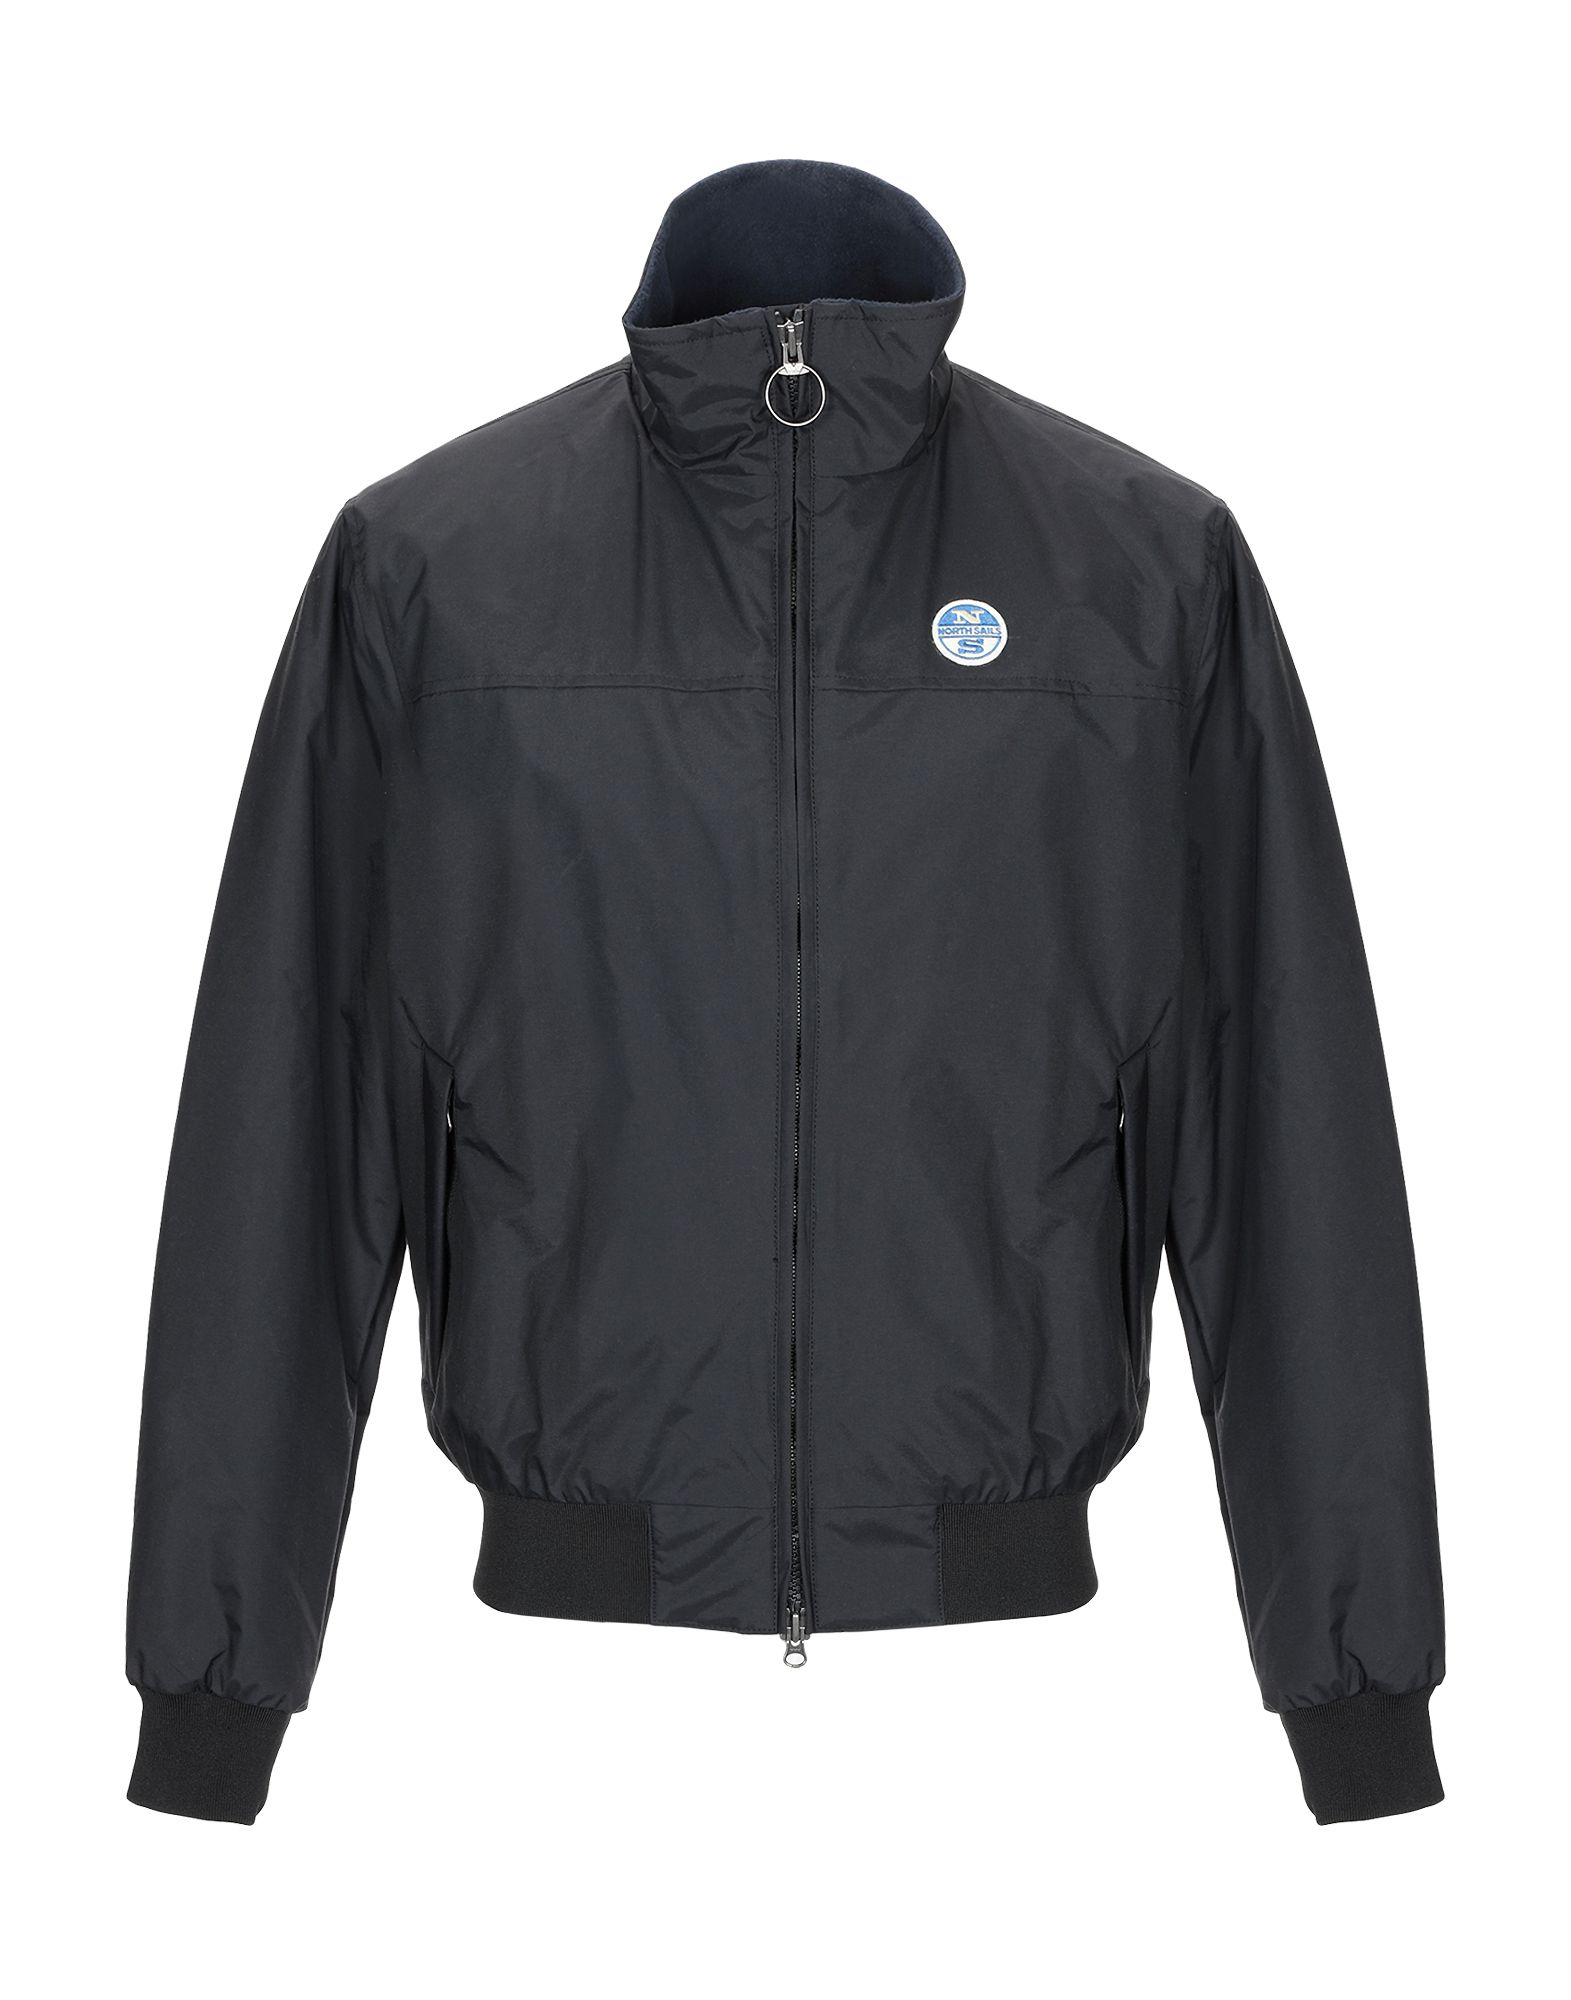 NORTH SAILS Куртка true north куртка софтшелл true north модель 2714004